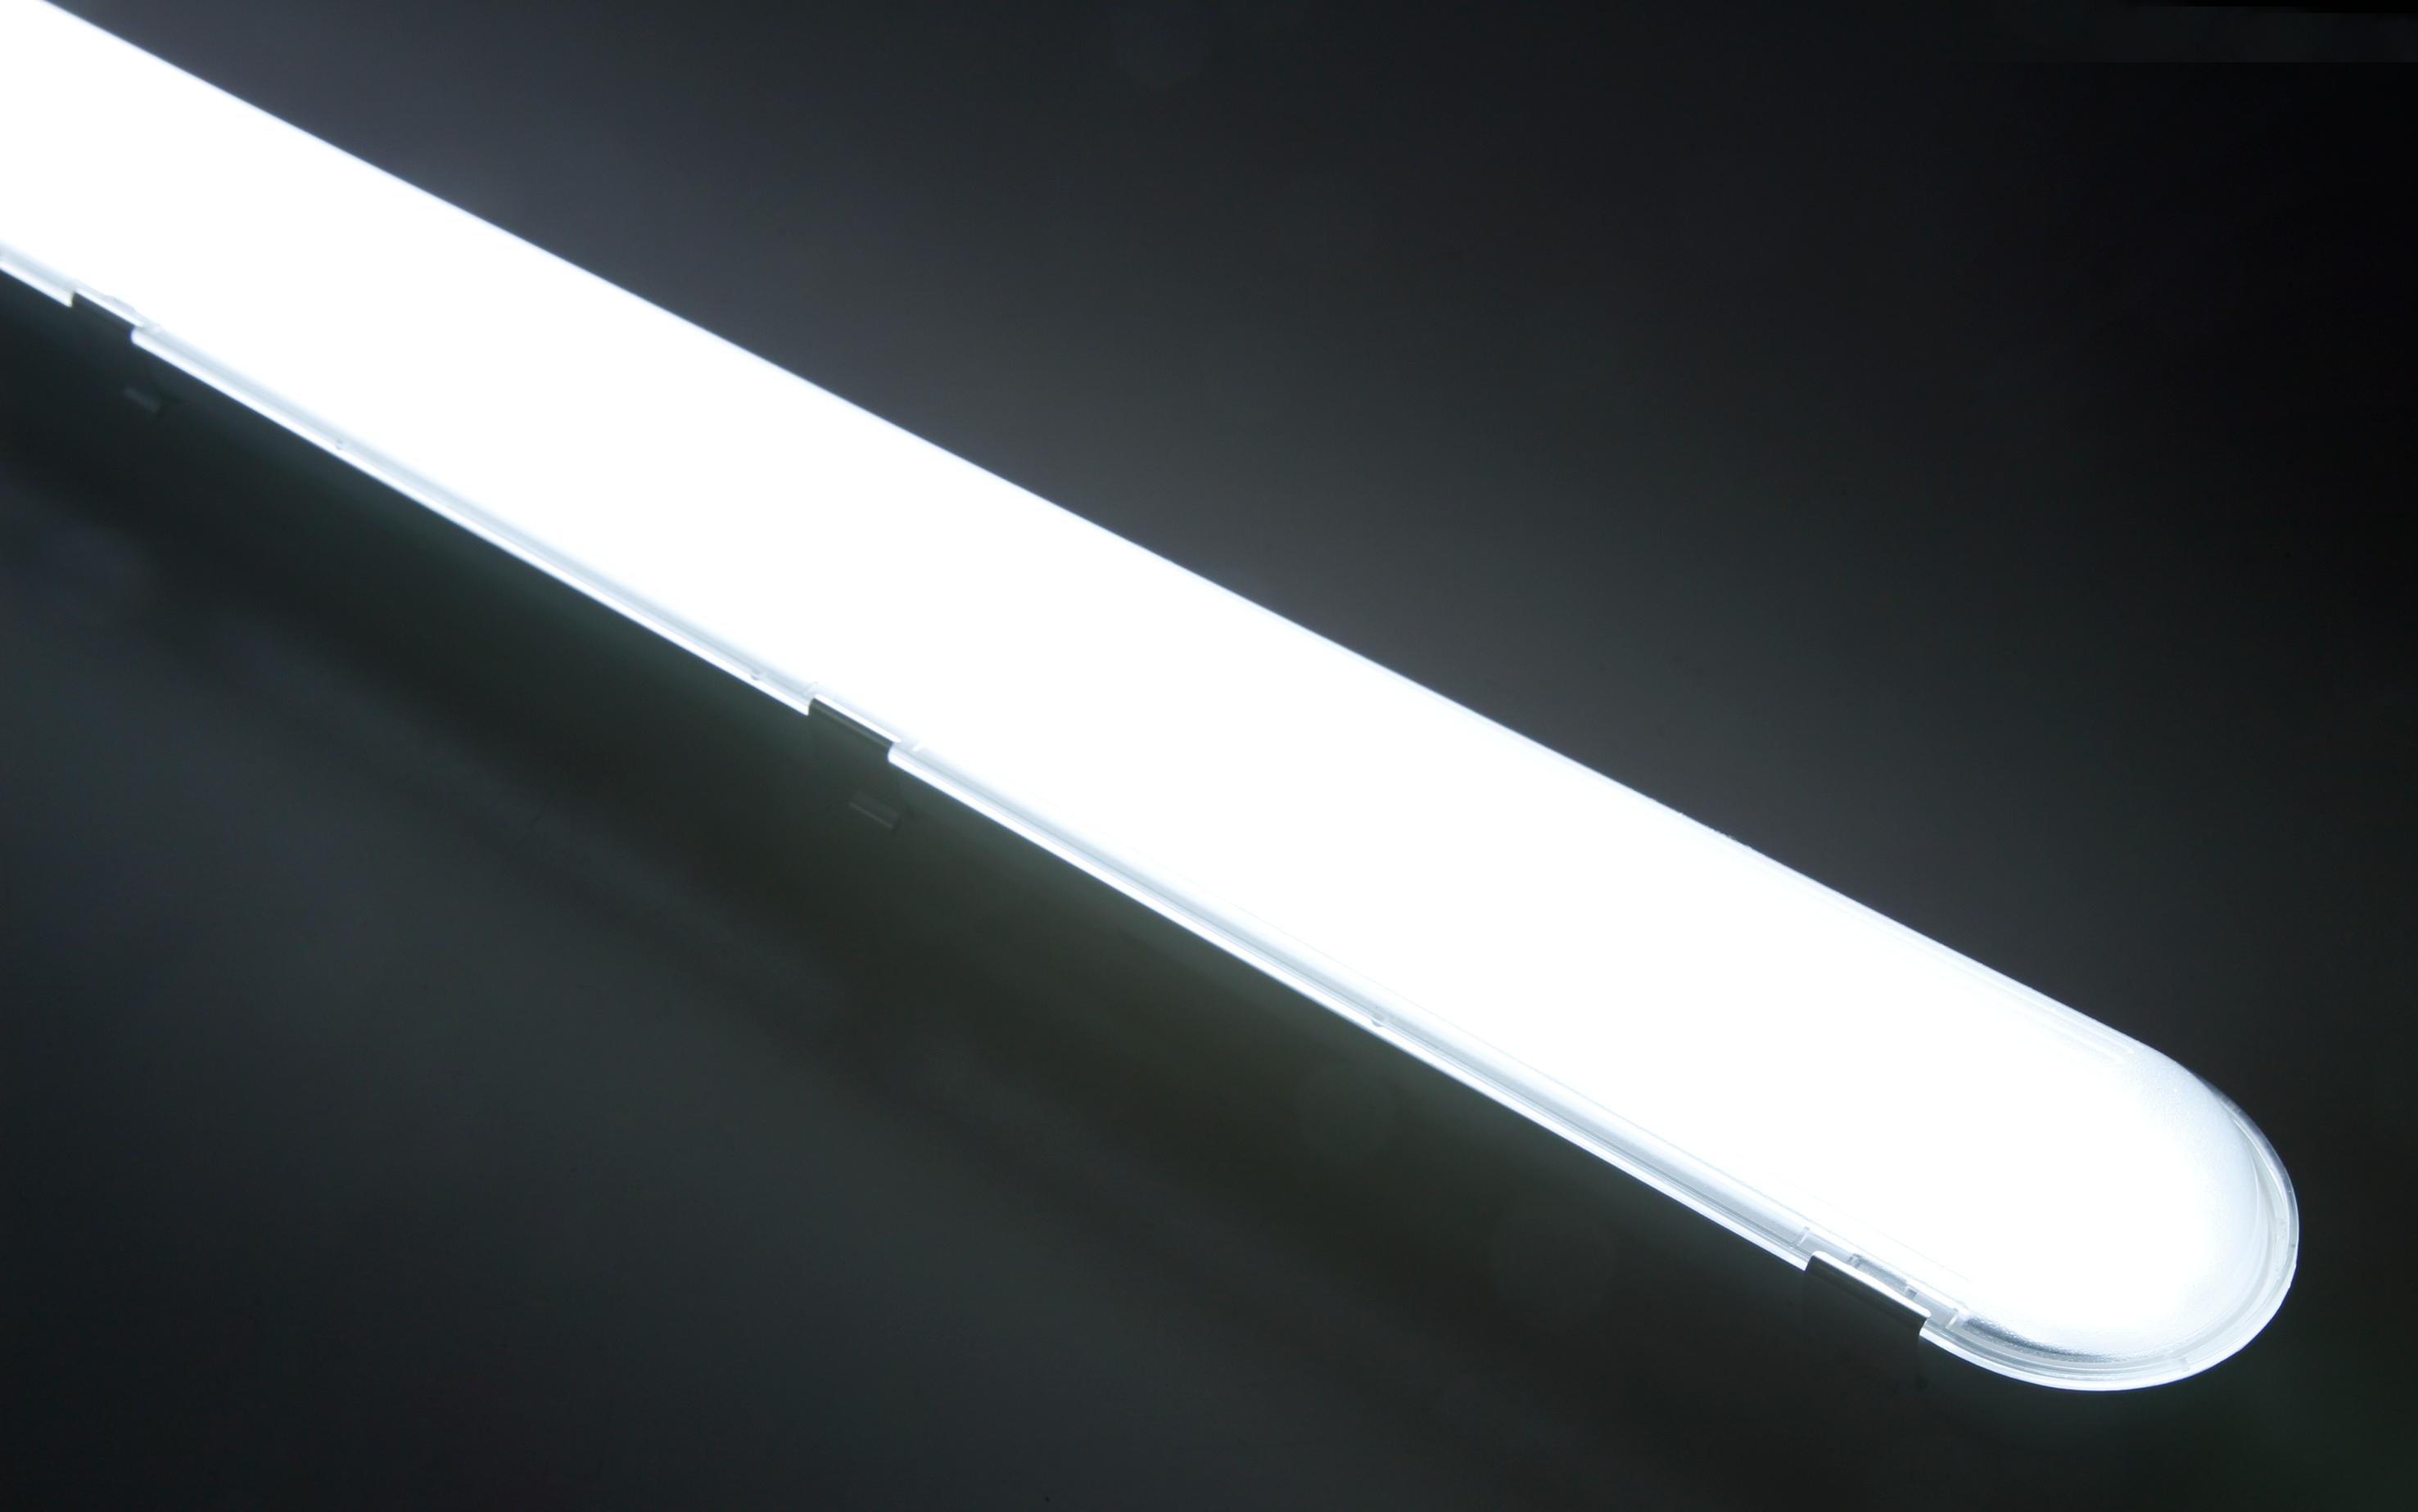 LED Feuchtraumleuchte McShine ''FL-215'', IP65, 7.200lm, 4000K, 150cm, neutralweiß